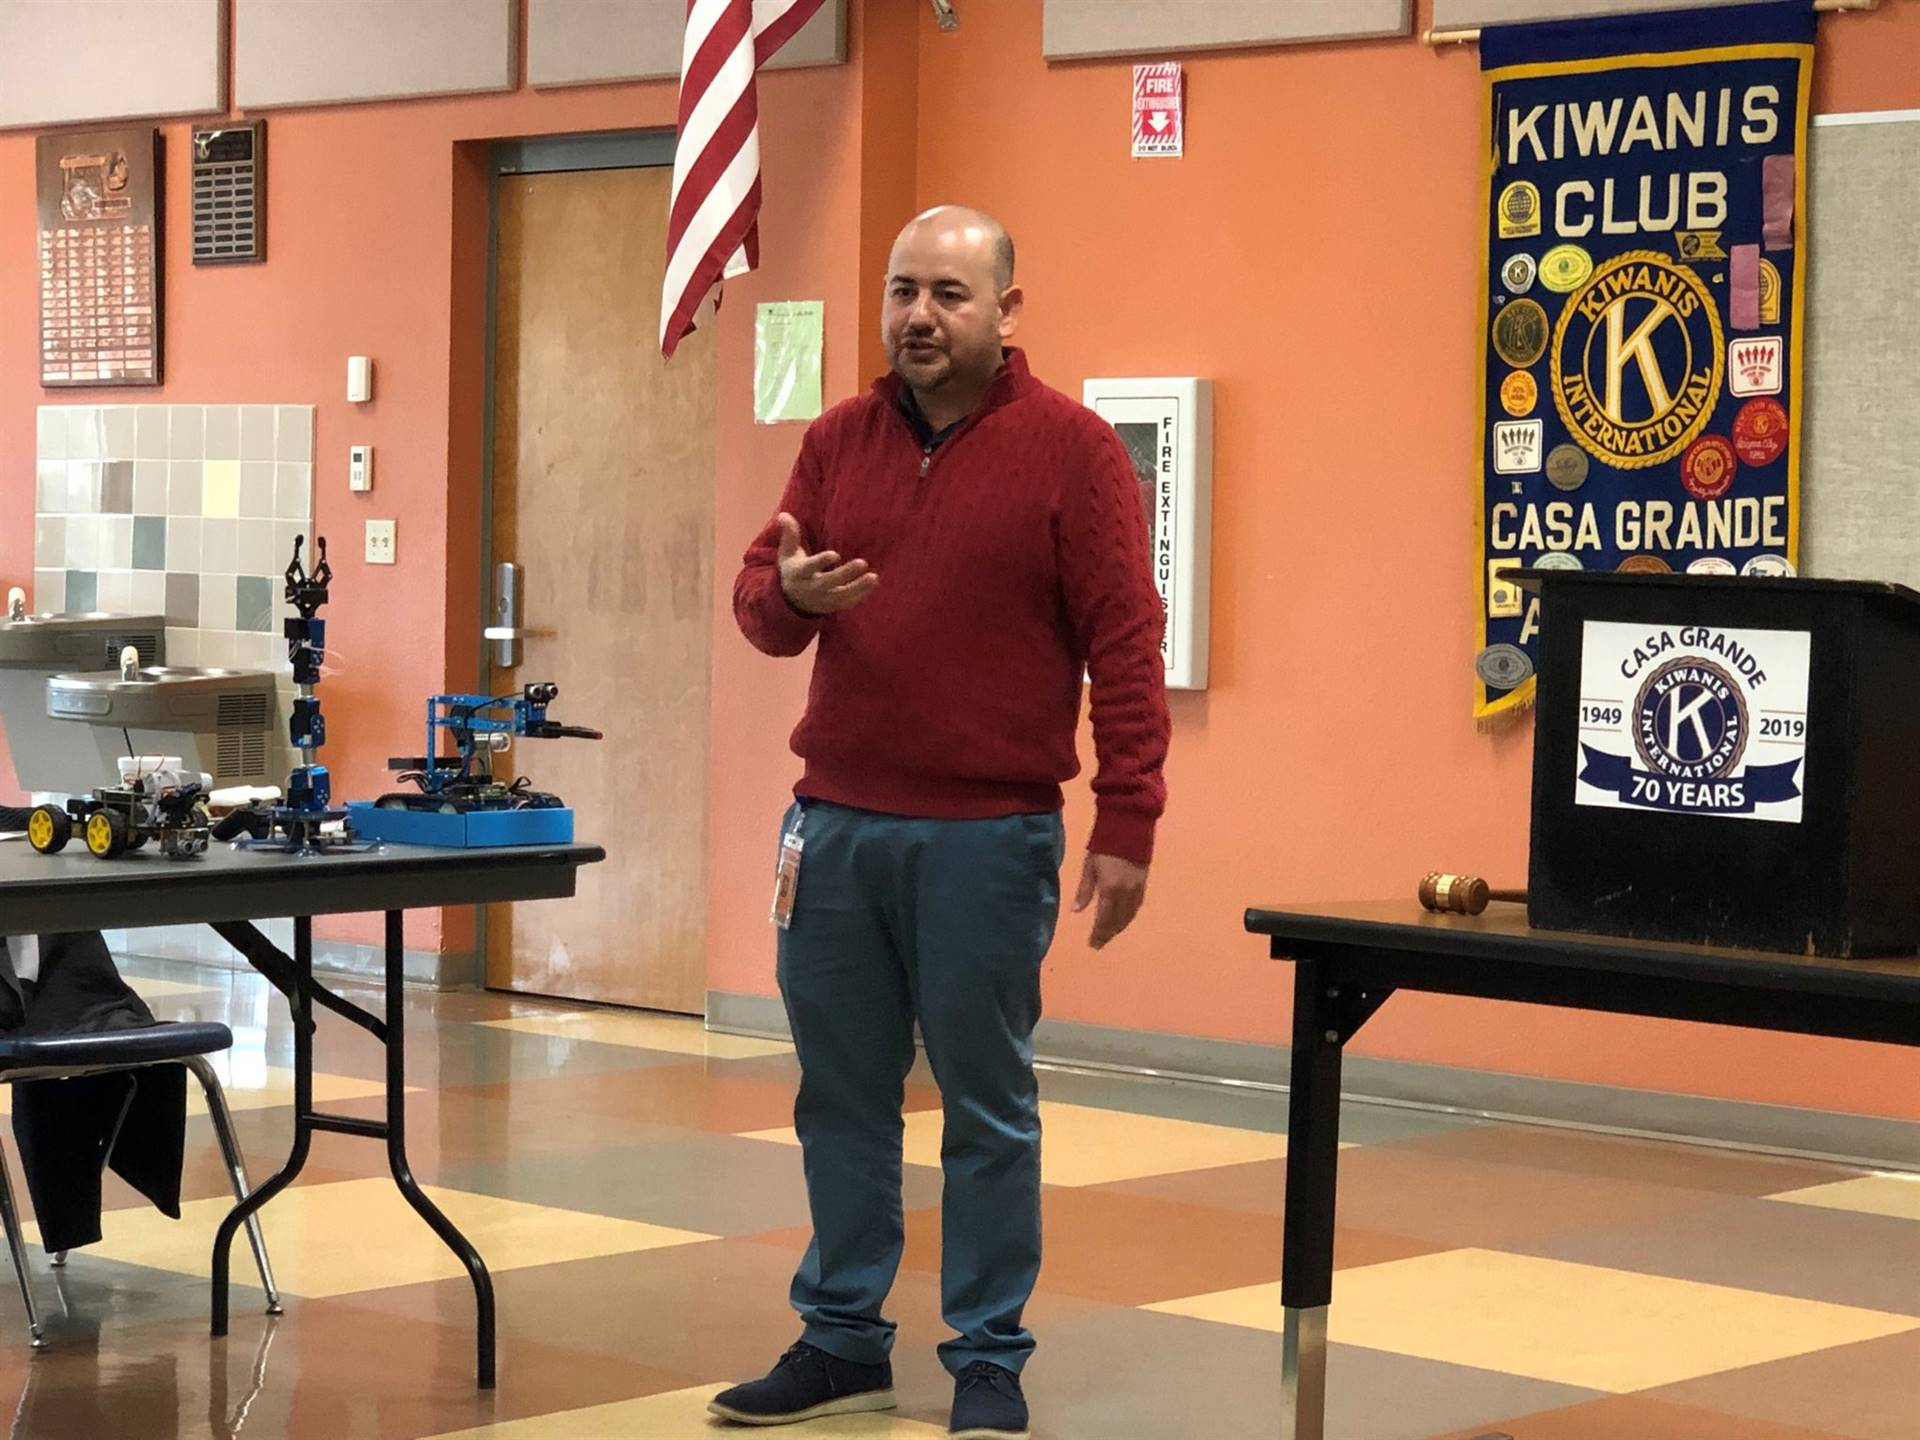 Kiwanis Club Meeting 20191212